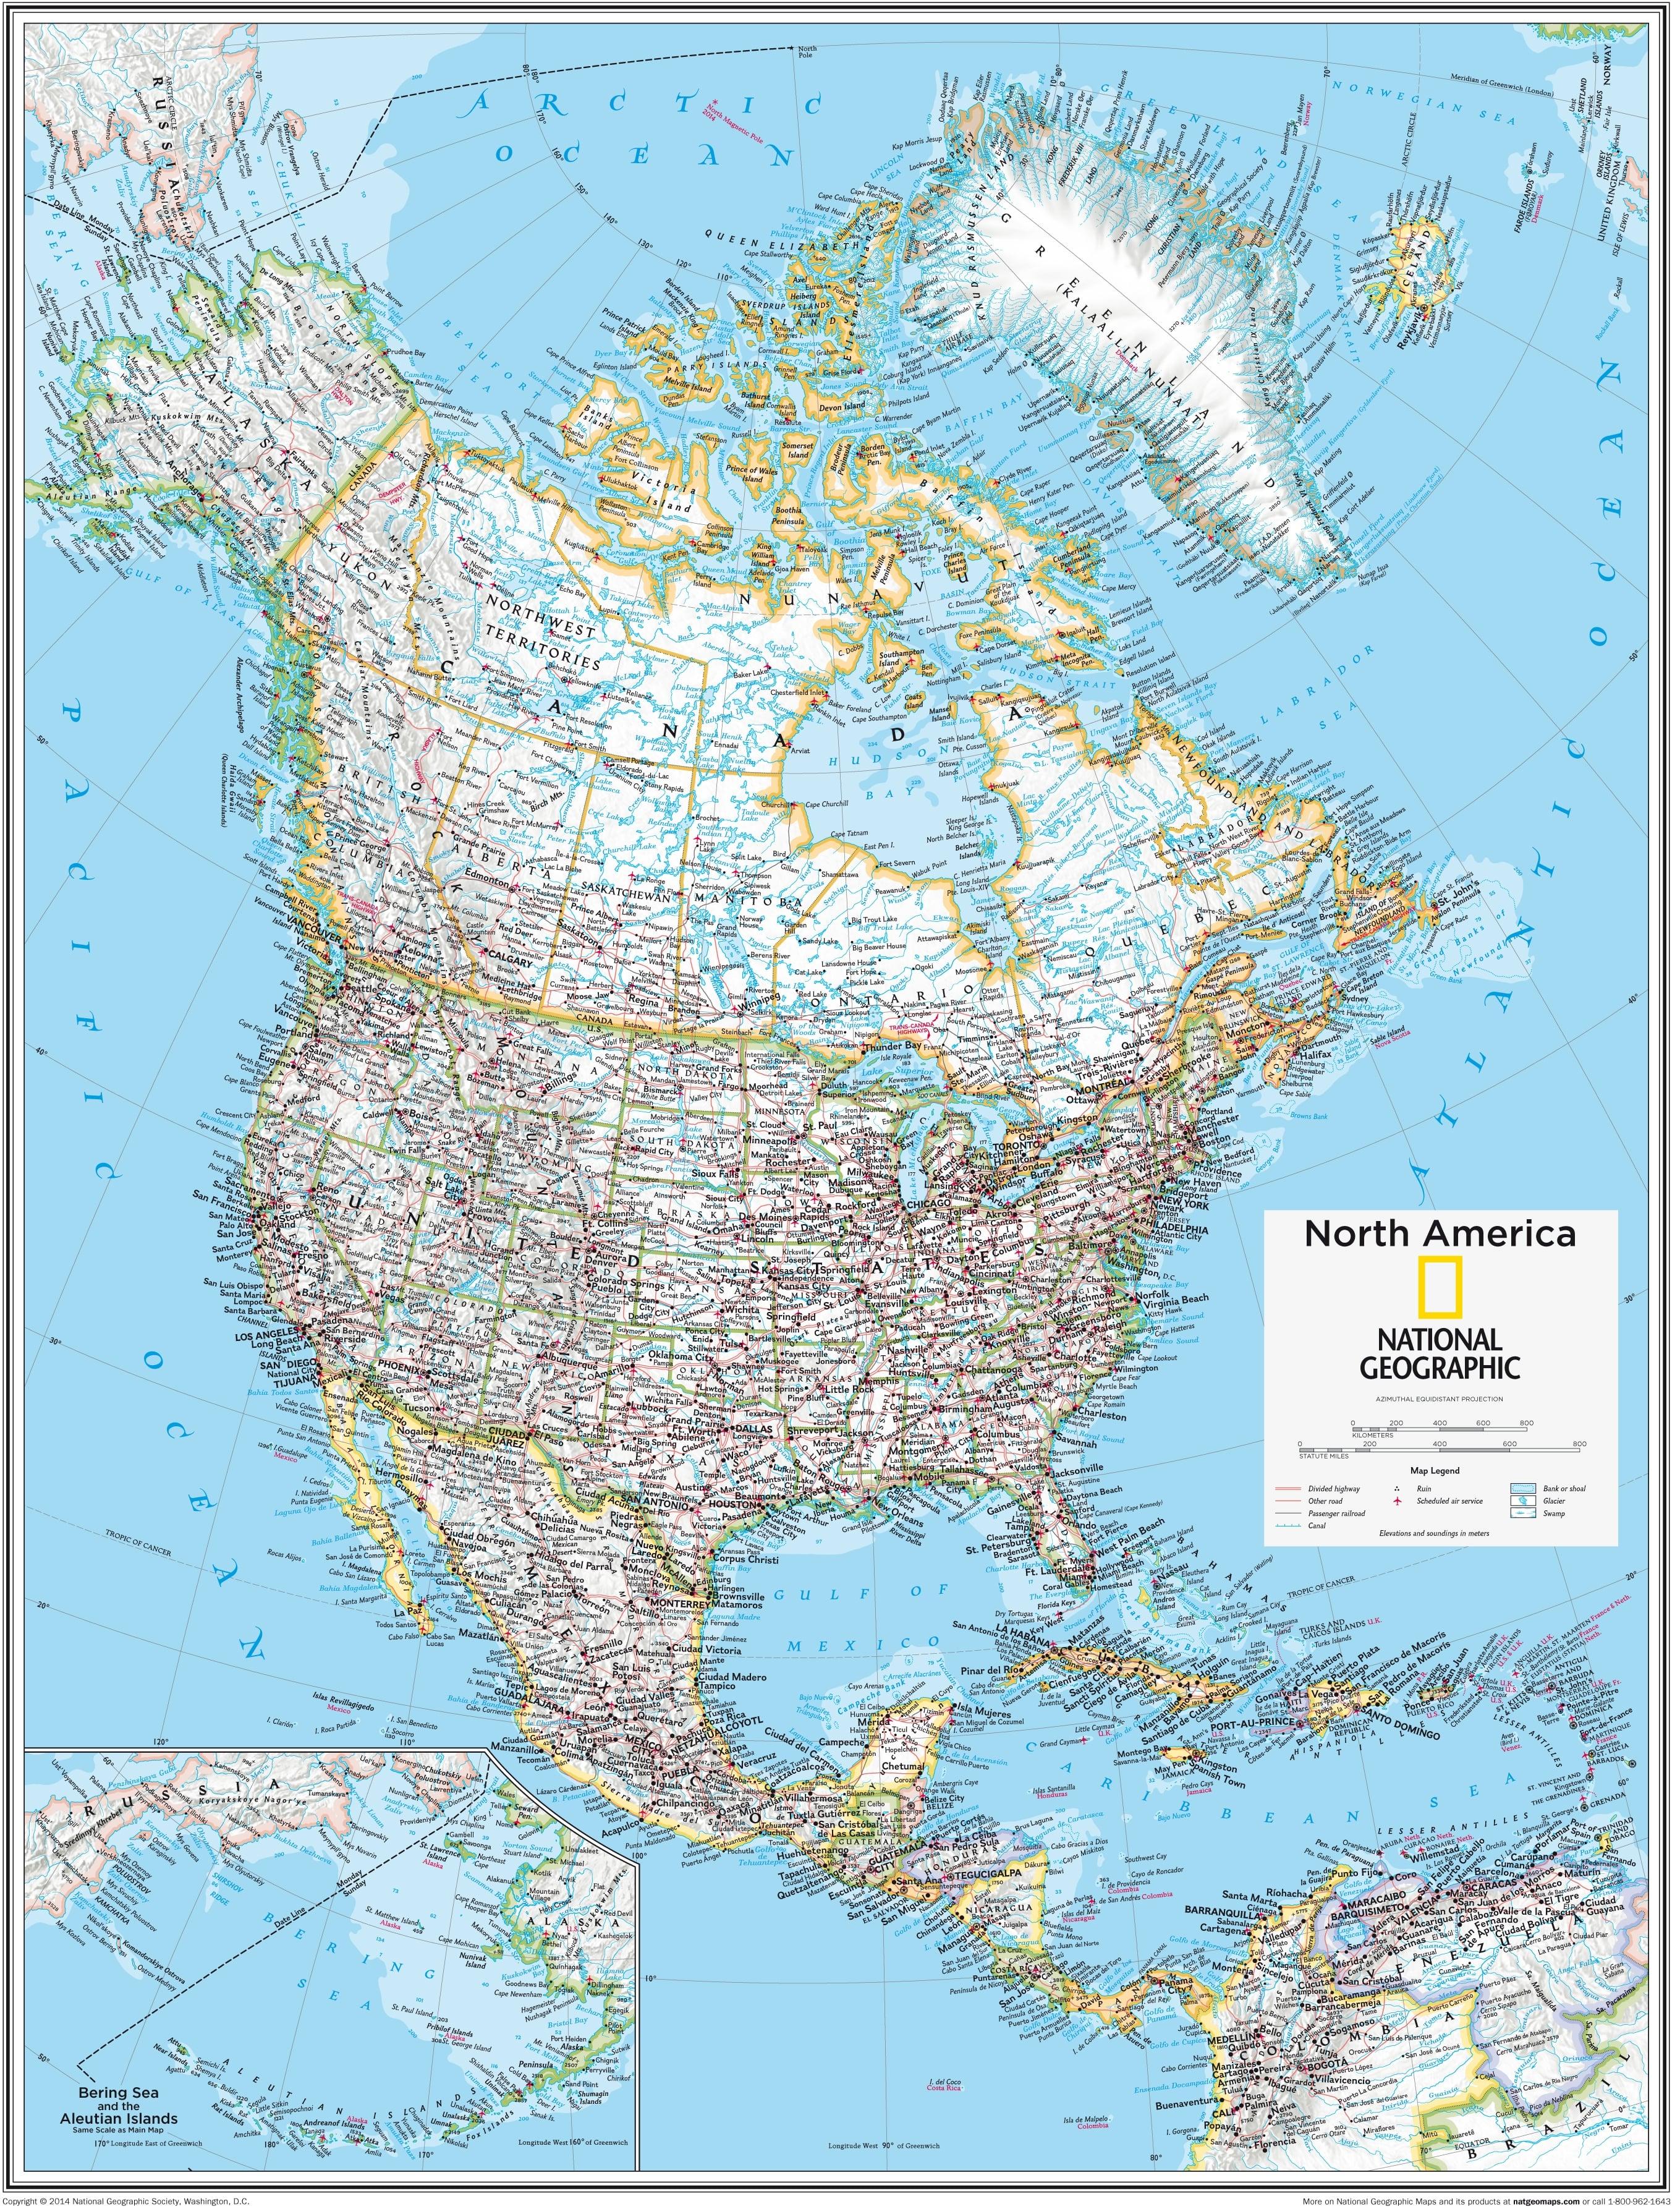 North America Map 73 x 91cm